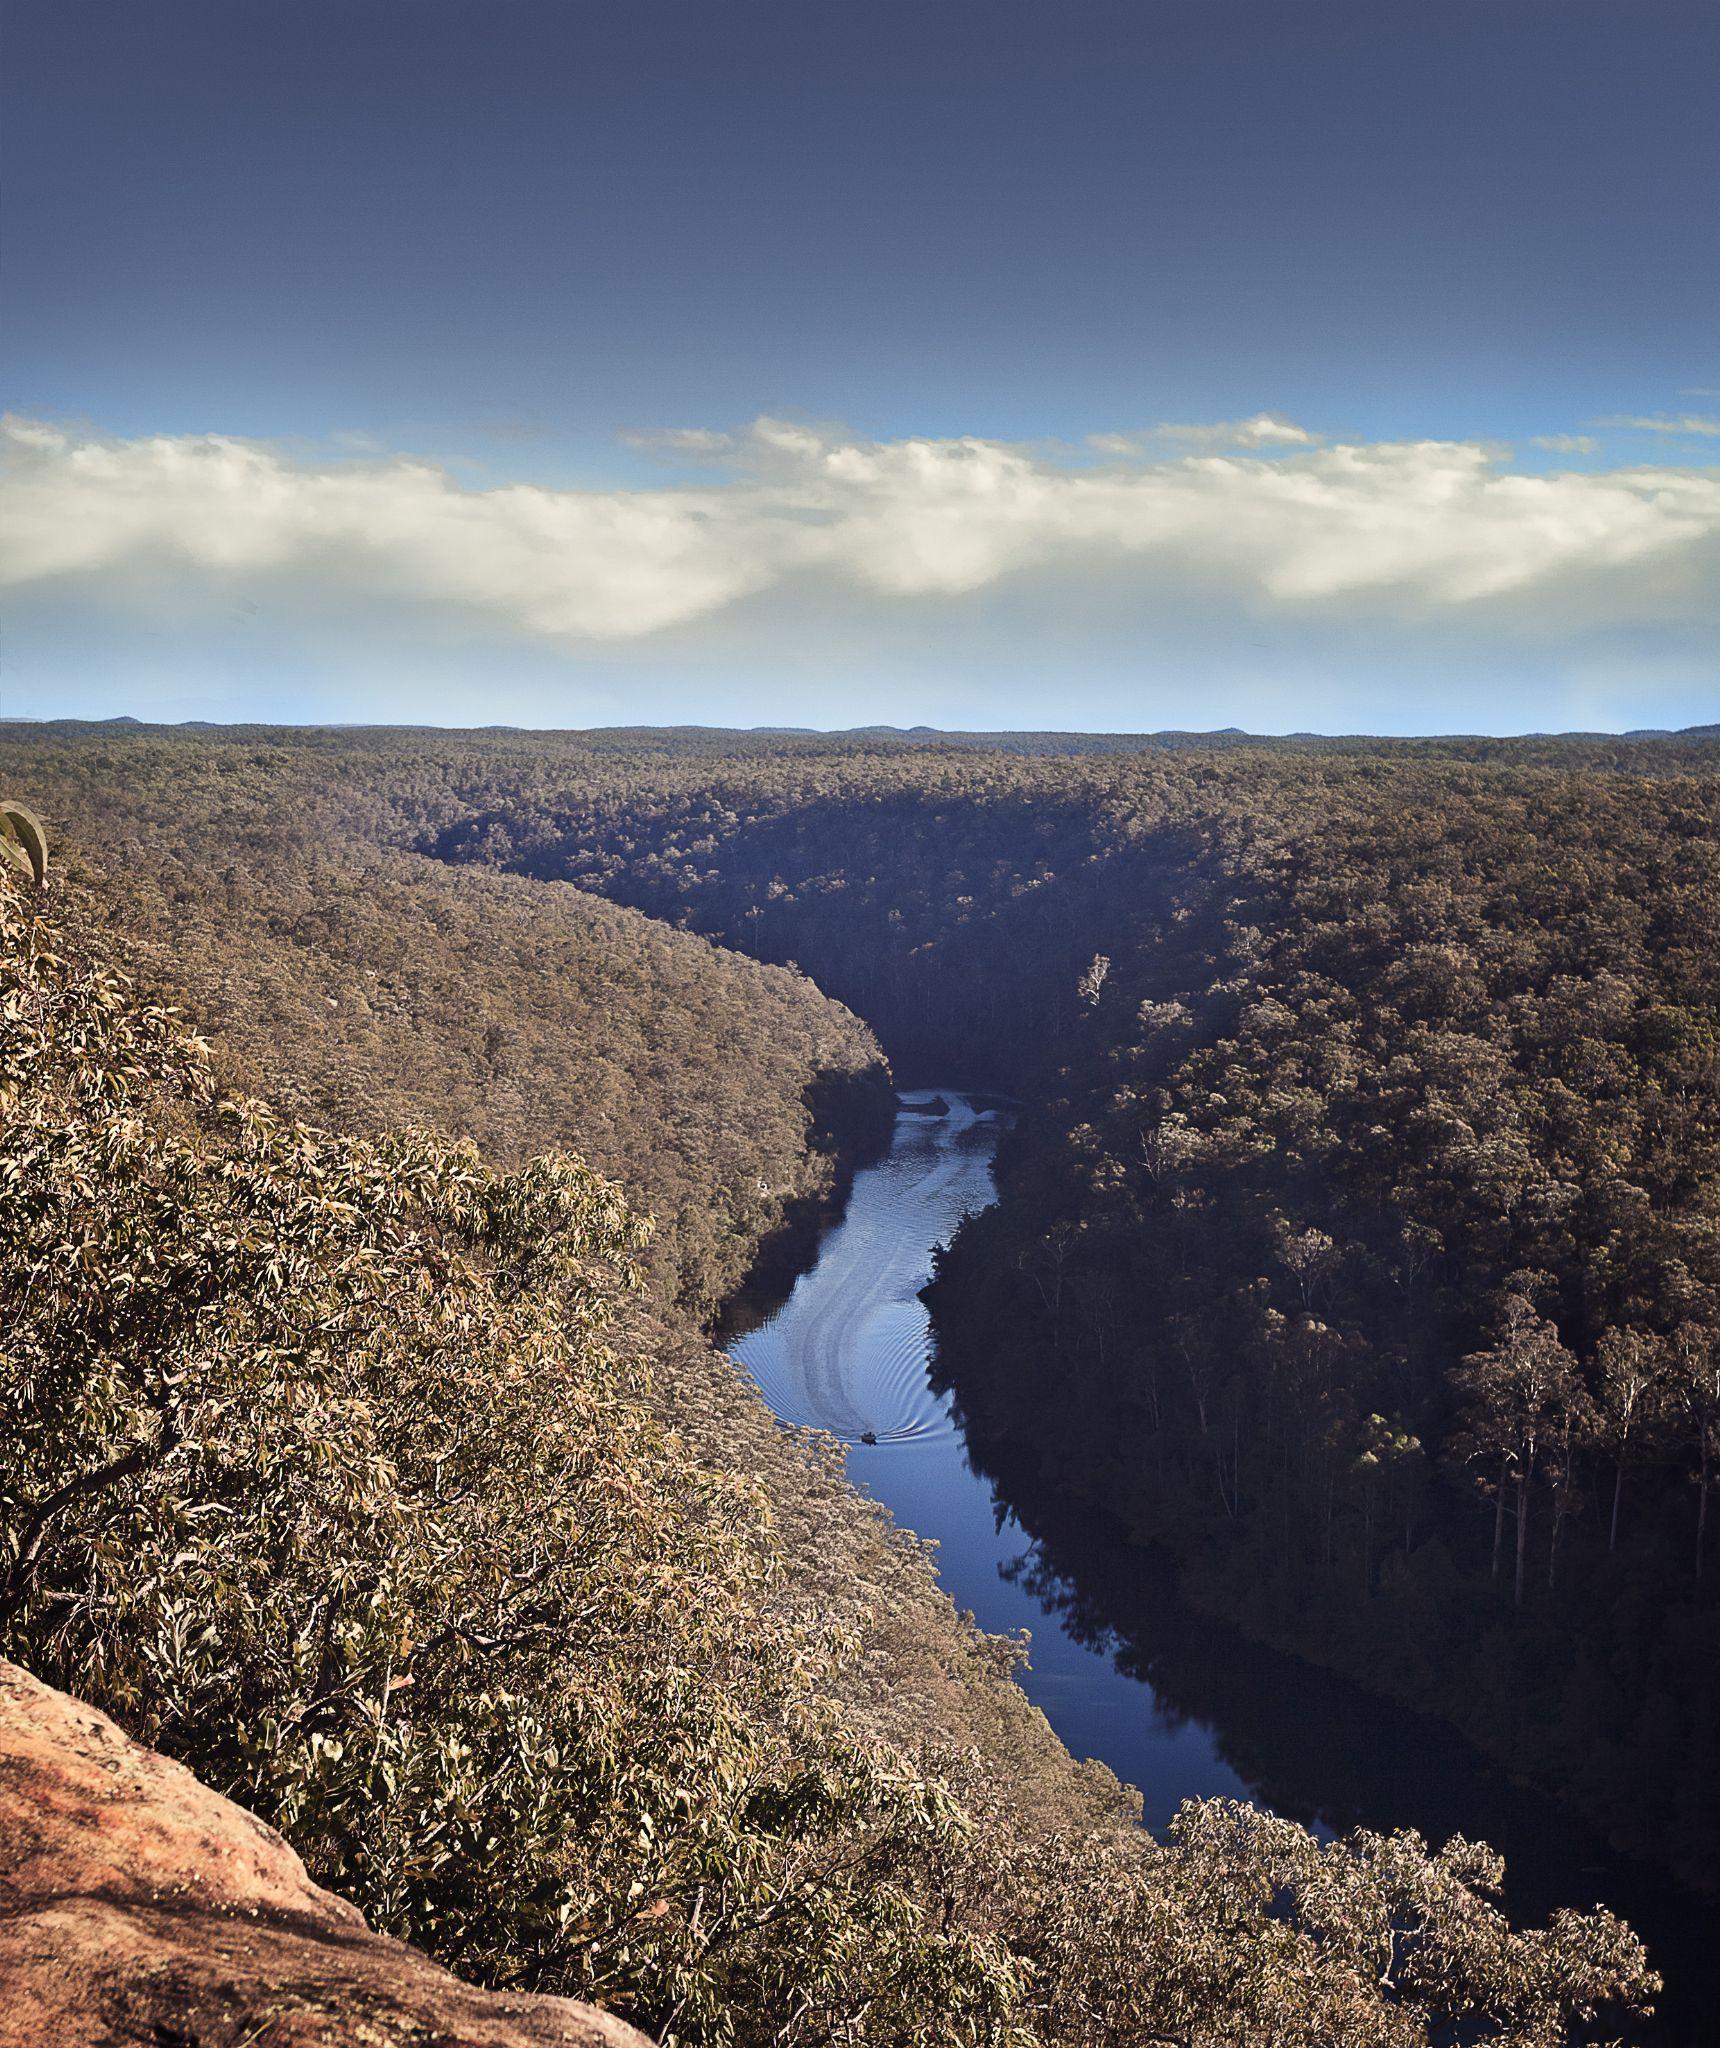 Tinny in the Gorge by nicolinekronast